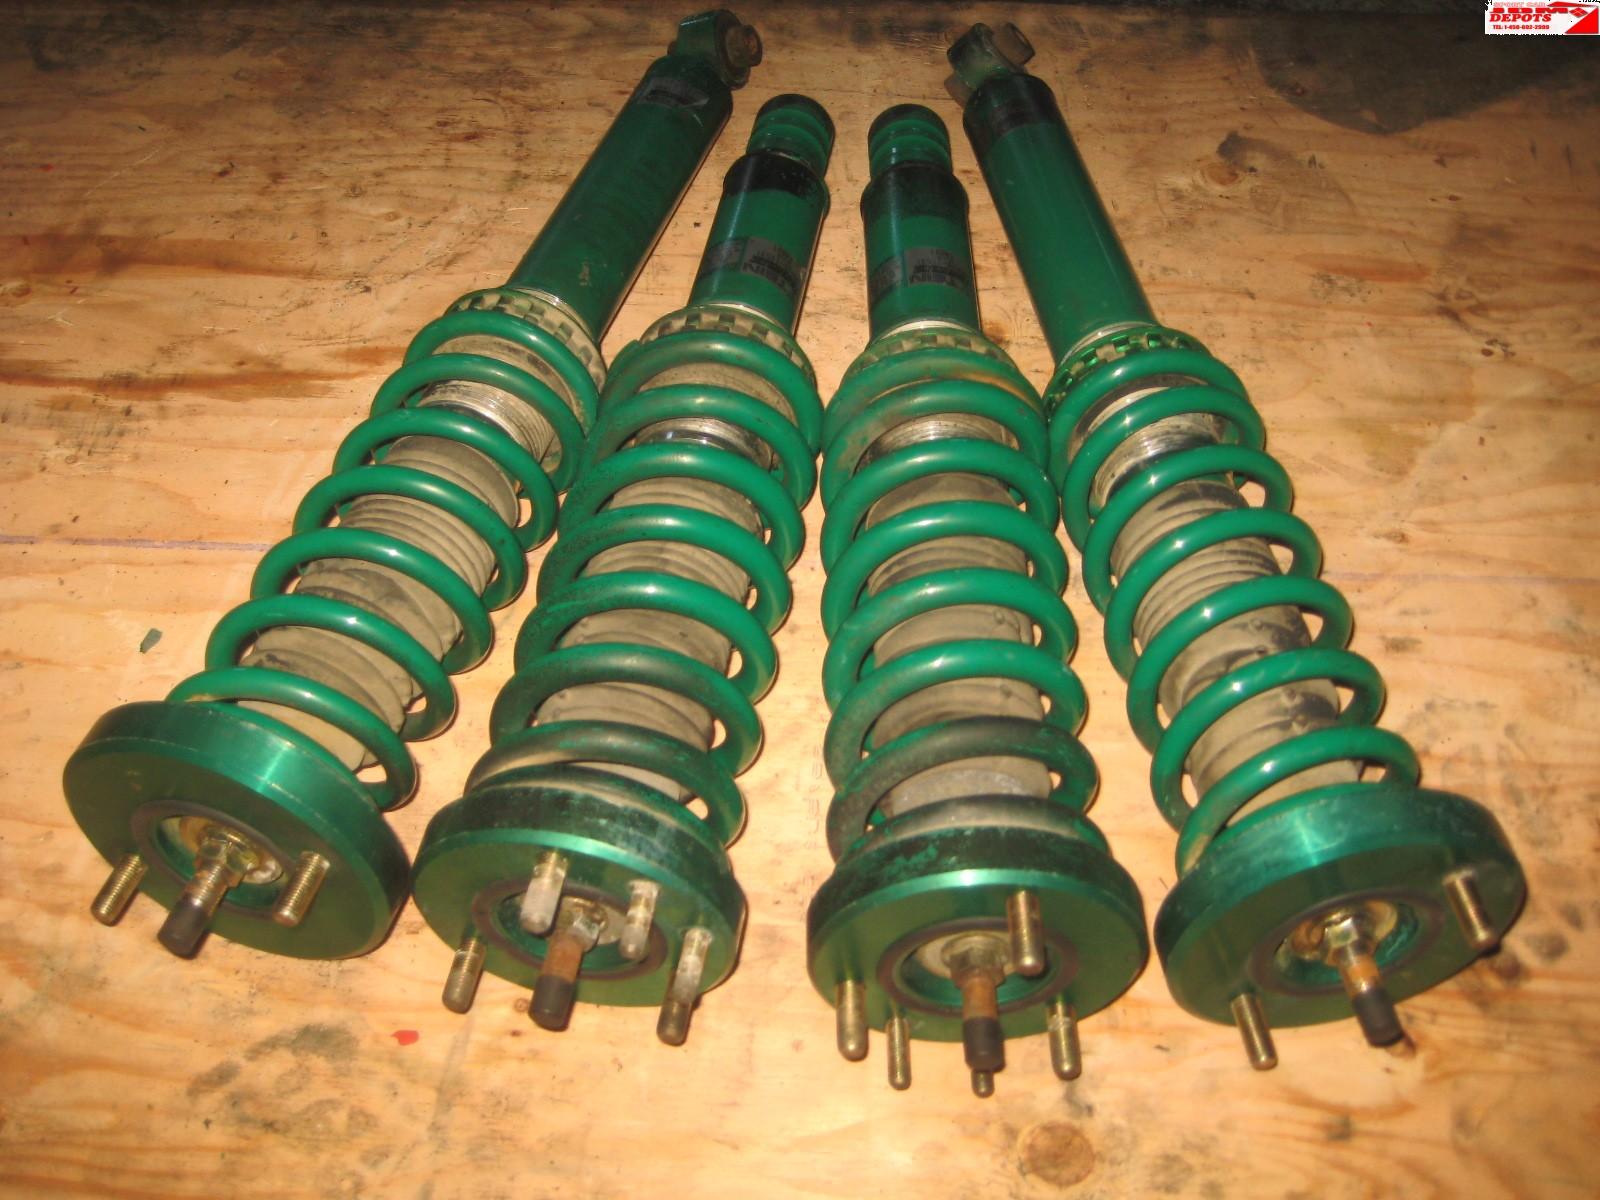 Jdm Honda Accord Coilovers, Jdm Acura TSX coilover, Jdm Acura TL coilovers, Jdm Honda Accord H22A suspensions, Jdm Acura TSX K24A adjustable coilovers, Jdm Acura TL shocks, Jdm Honda Accord shocks, Jdm k24a coilovers suspension shocks, Jdm h22a coilovers,